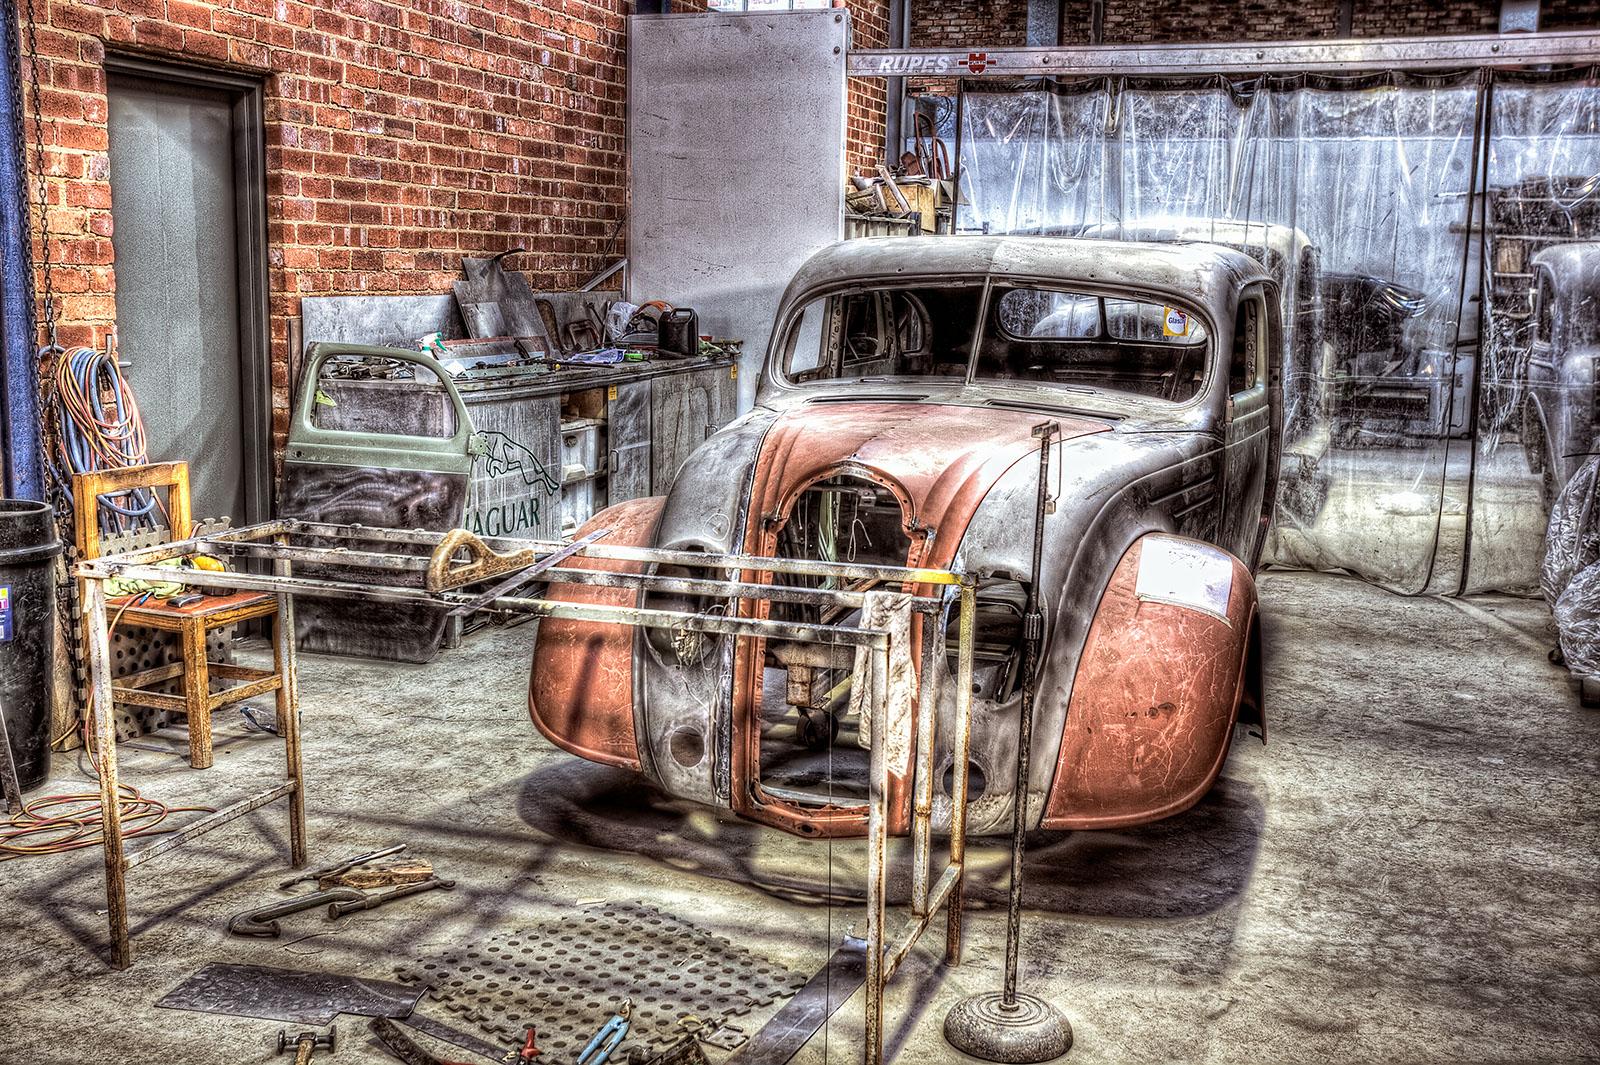 1935 DeSoto Airflow bodywork